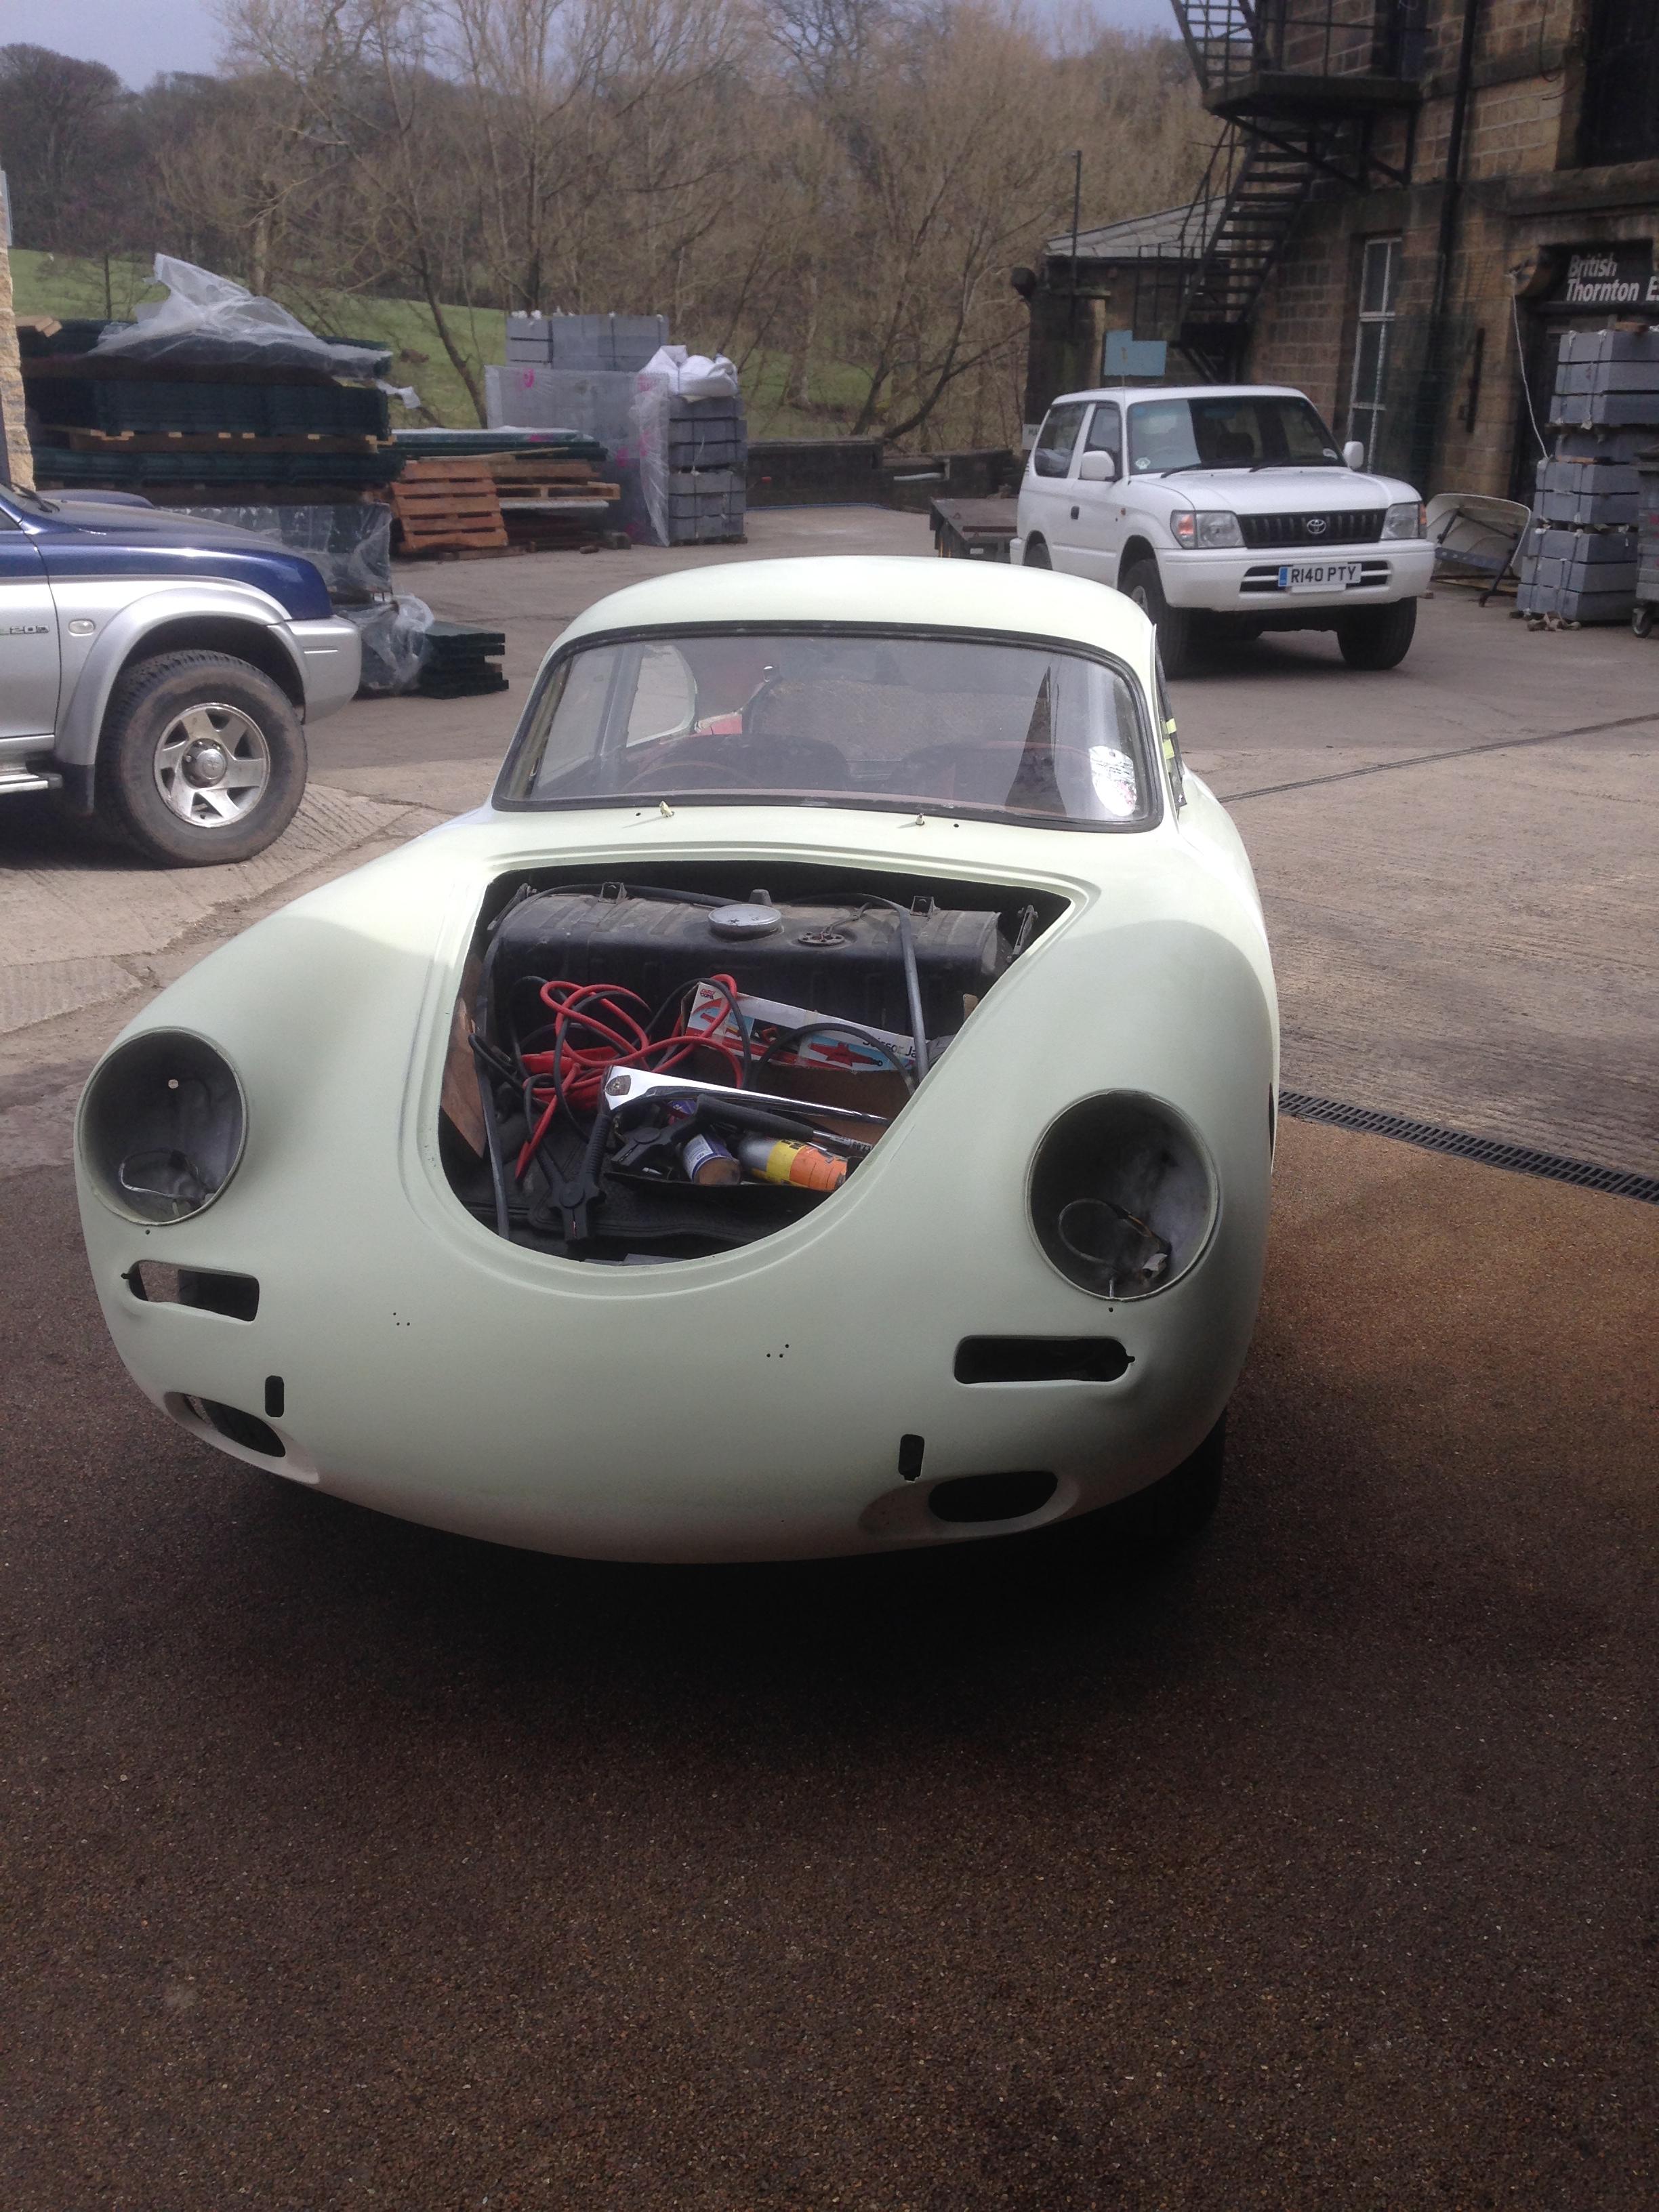 Porsche 356 B 1961 - Post-priming